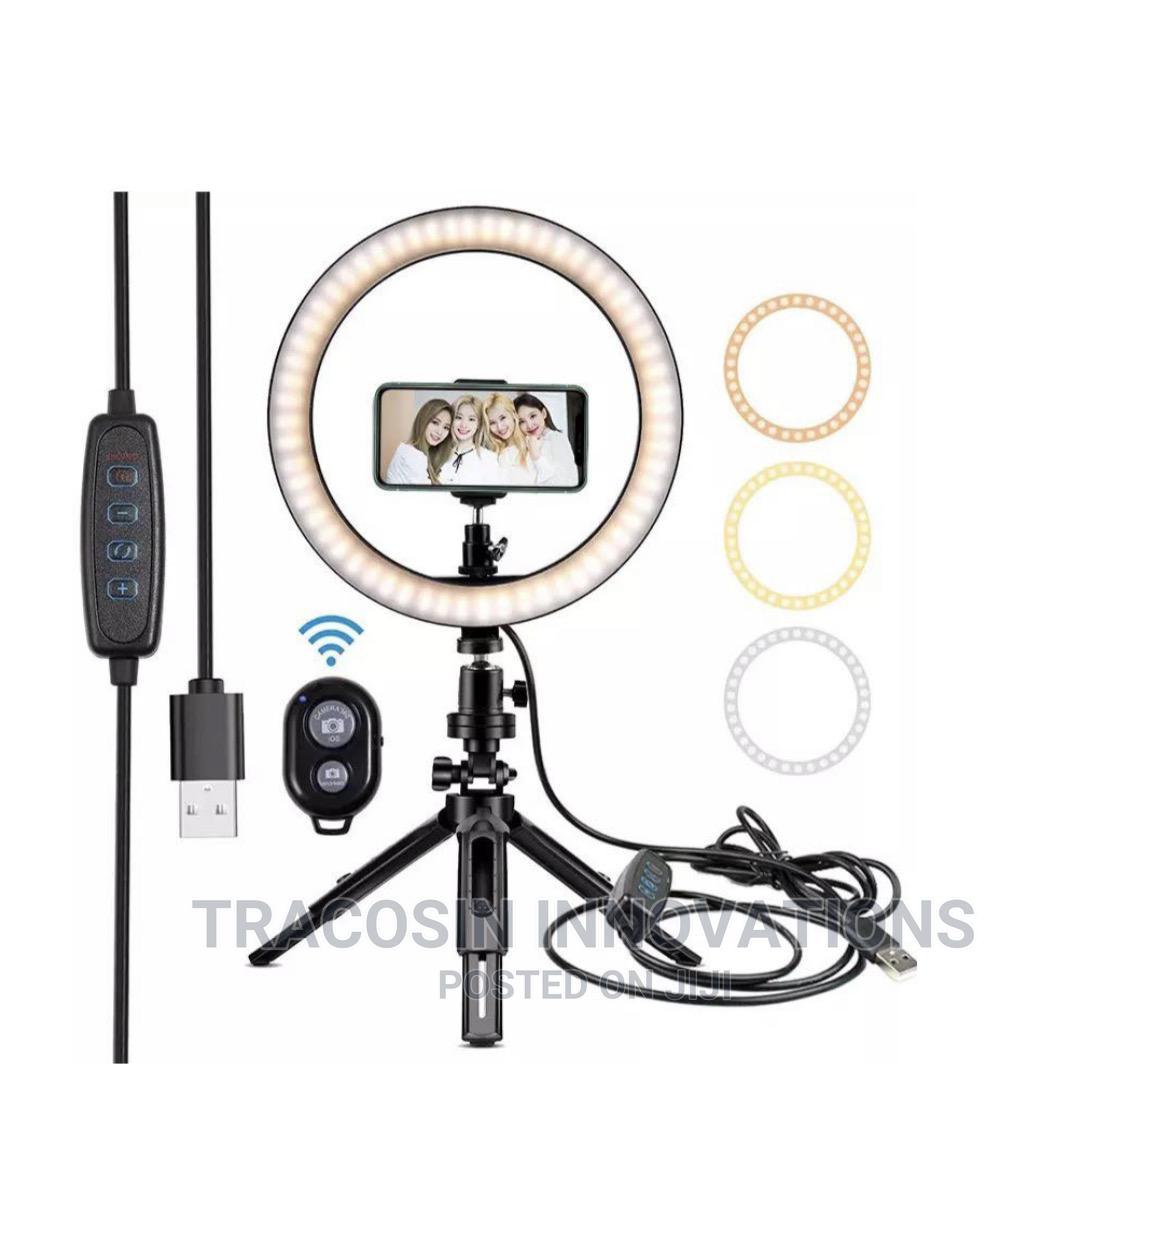 "10"" Tripod Table Makeup Video Handheld Selfie BT Ring Light"